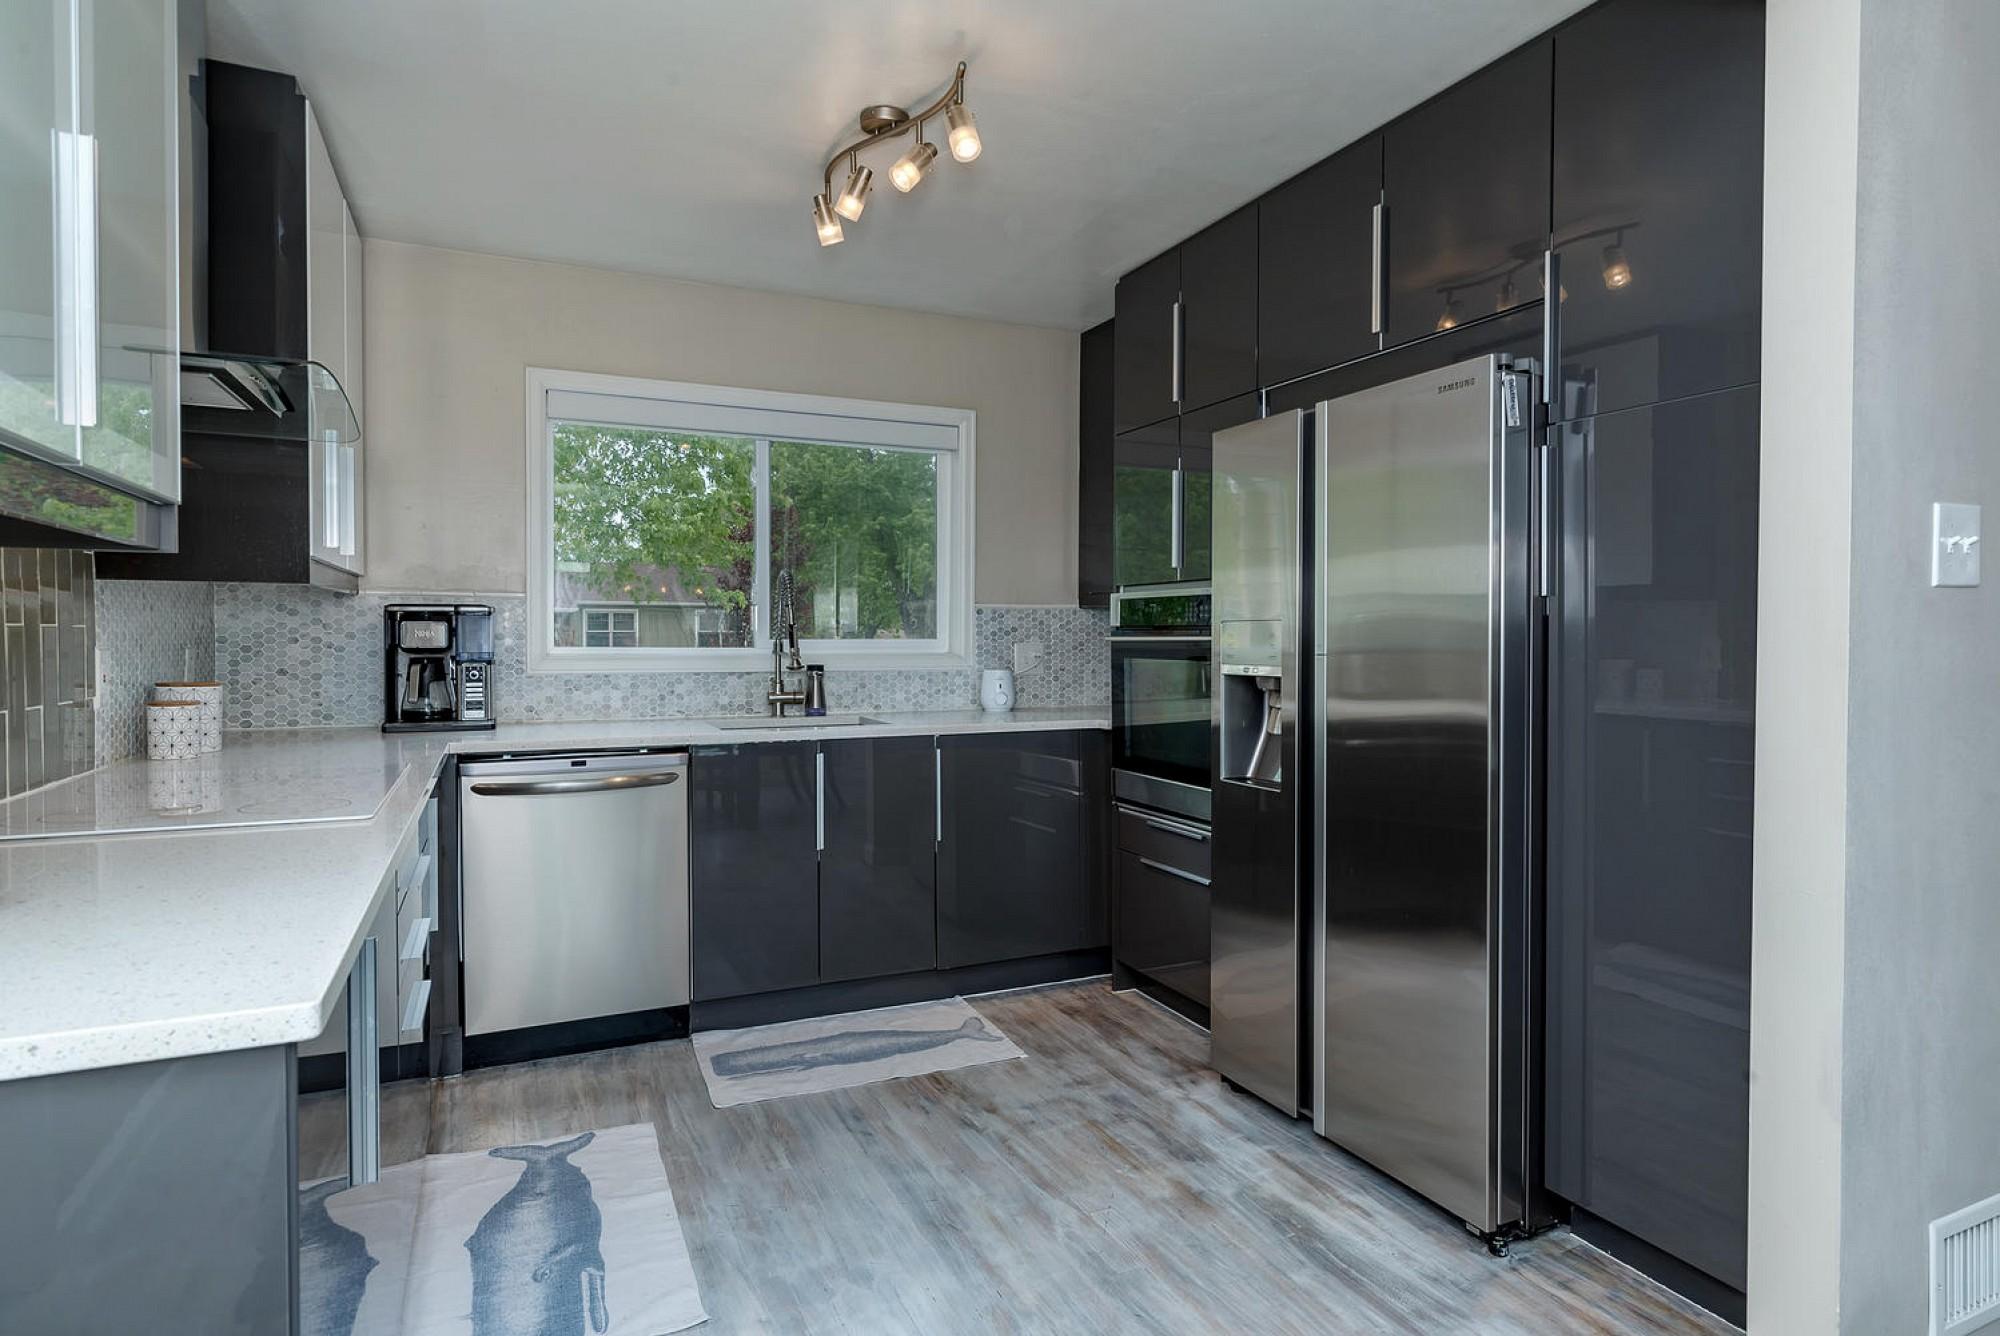 4980 S. Washington Street, Englewood, CO 80113